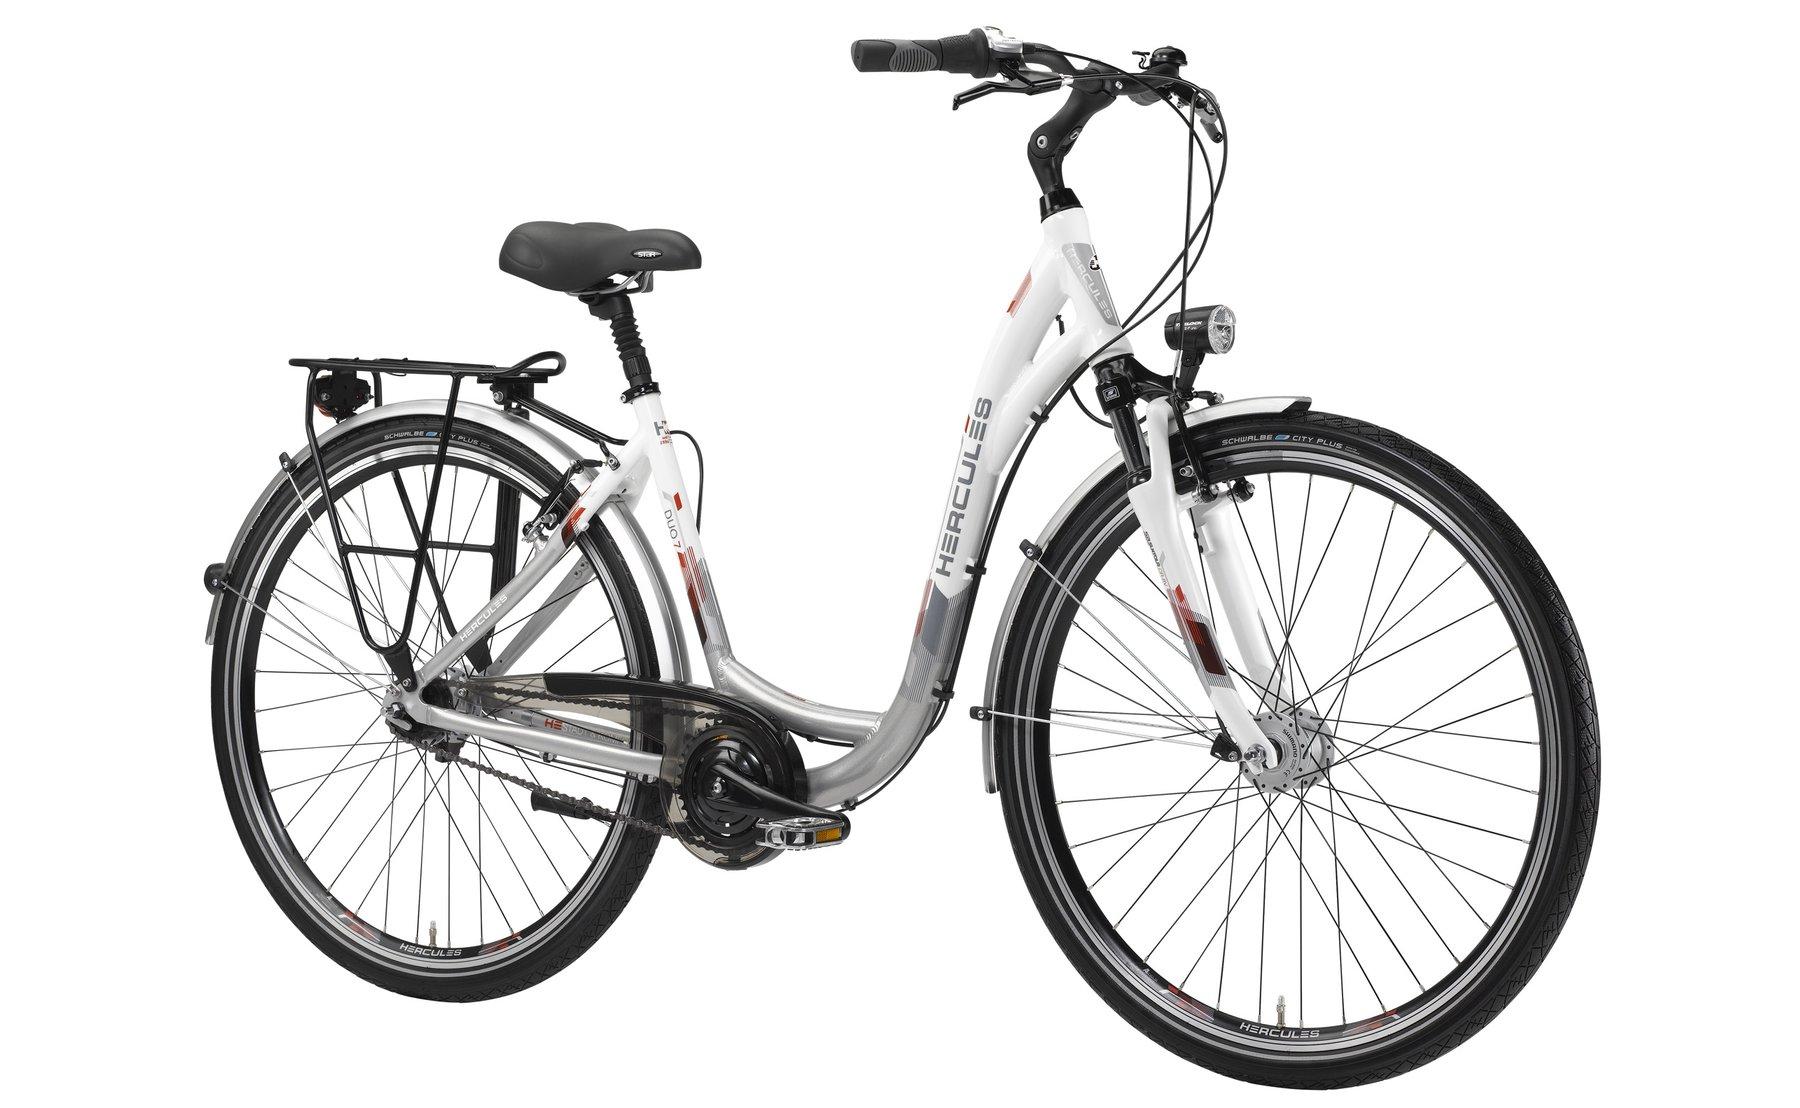 hercules duo 7 auslaufmodell 28 zoll g nstig kaufen fahrrad xxl. Black Bedroom Furniture Sets. Home Design Ideas